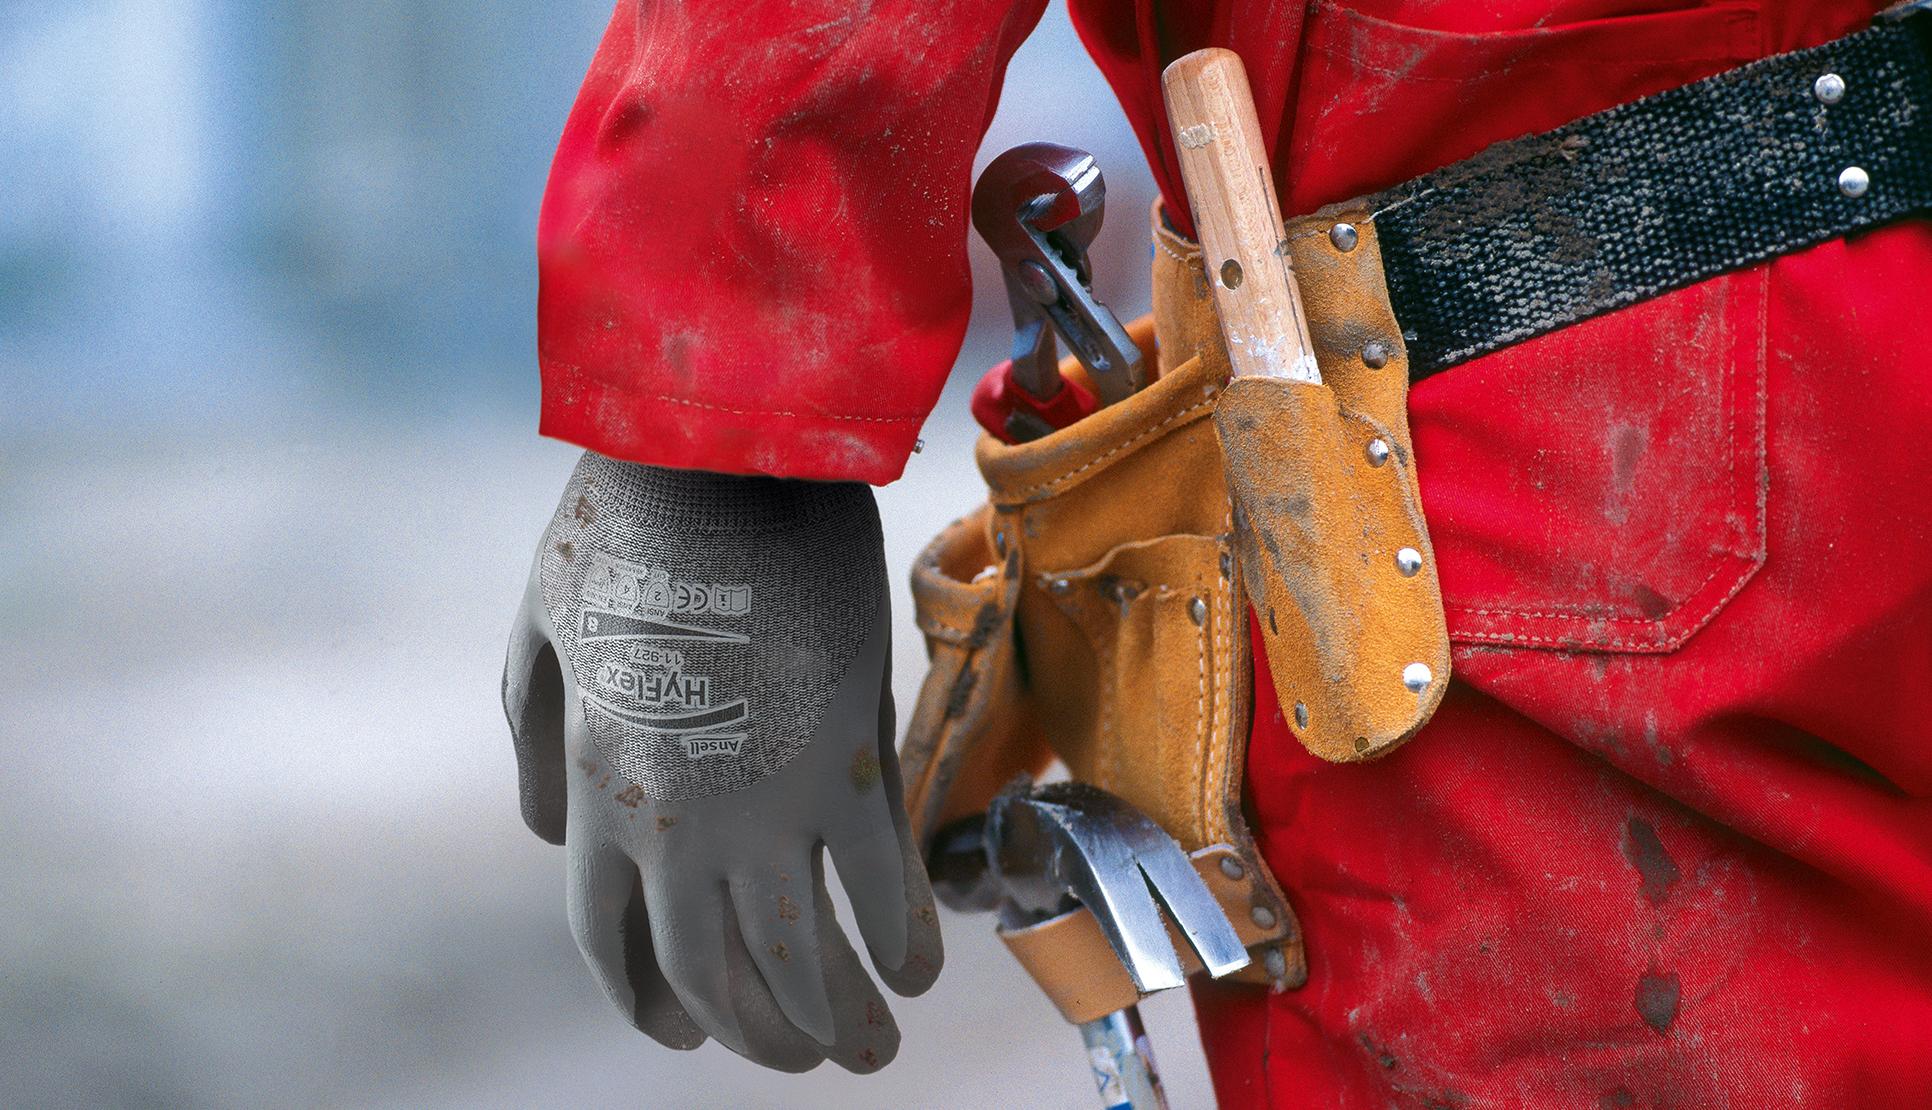 European regulation regarding Personal Protective Equipment